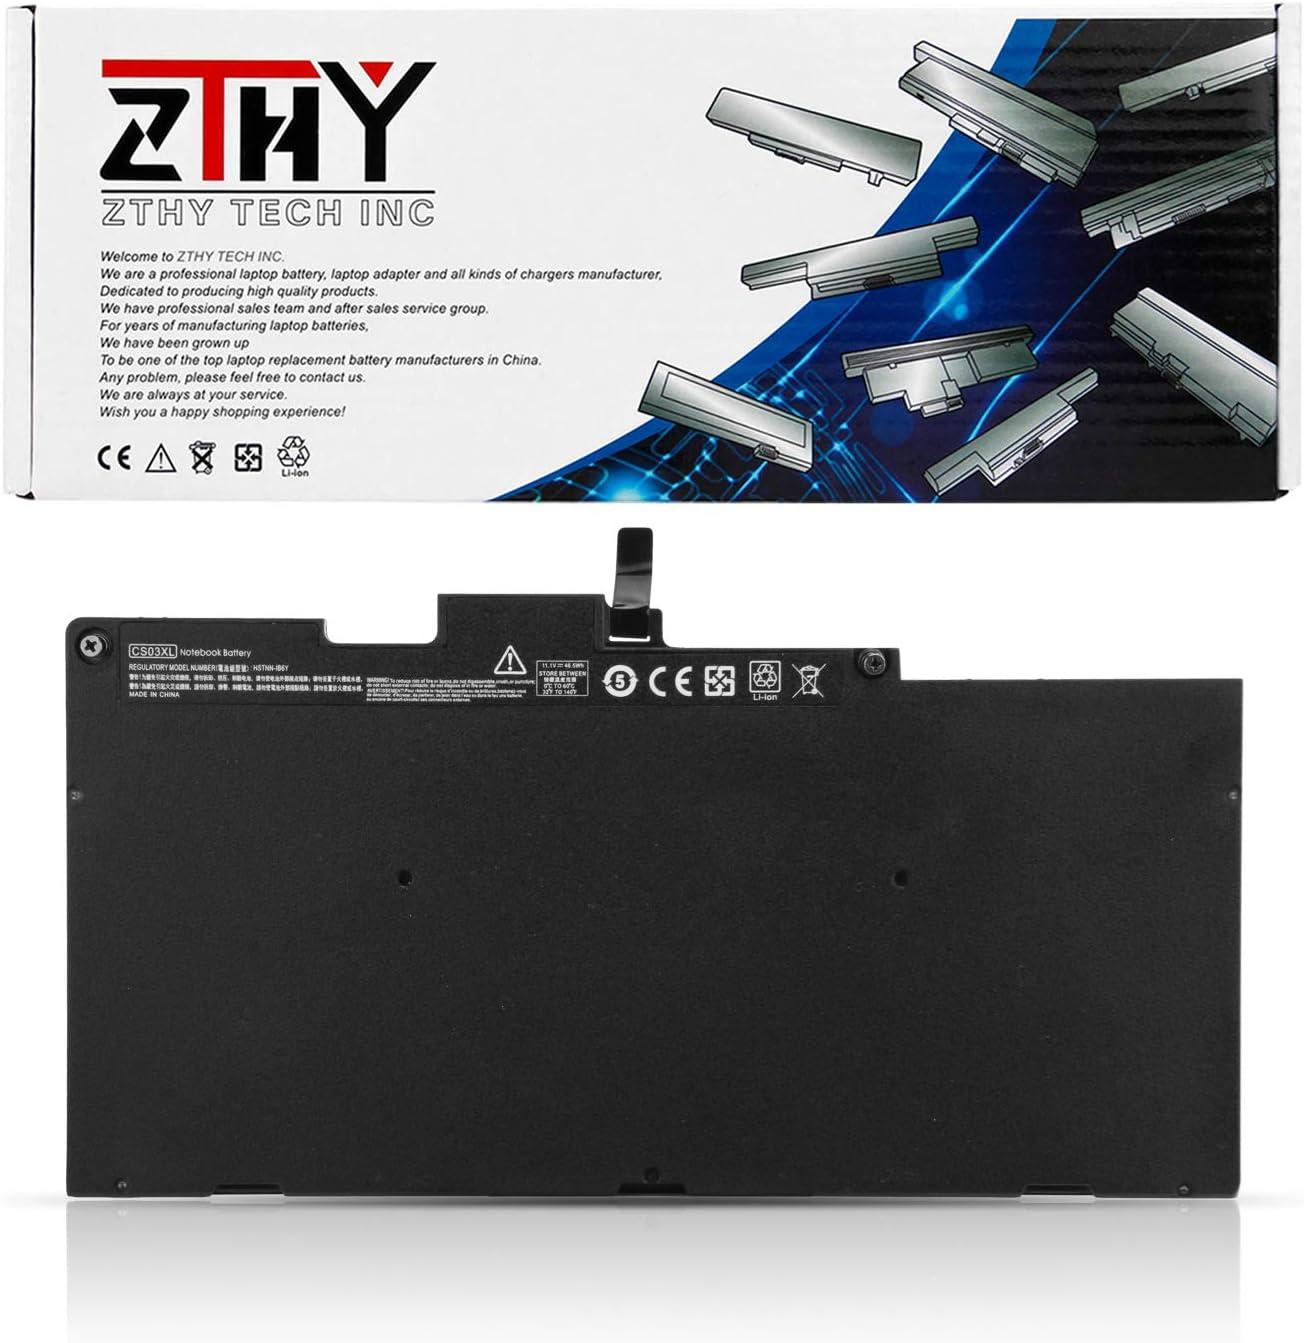 ZTHY CS03XL Laptop Battery for HP EliteBook 840 G3 848 G3 850 G3 755 G3 745 G3 EliteBook 840 G4 848 G4 850 G4 755 G4 745 G4 ZBook 15u G3 G4 mt42 mt43 Series 800231-1C1 800513-001 11.1V 46.5Wh 3Cell